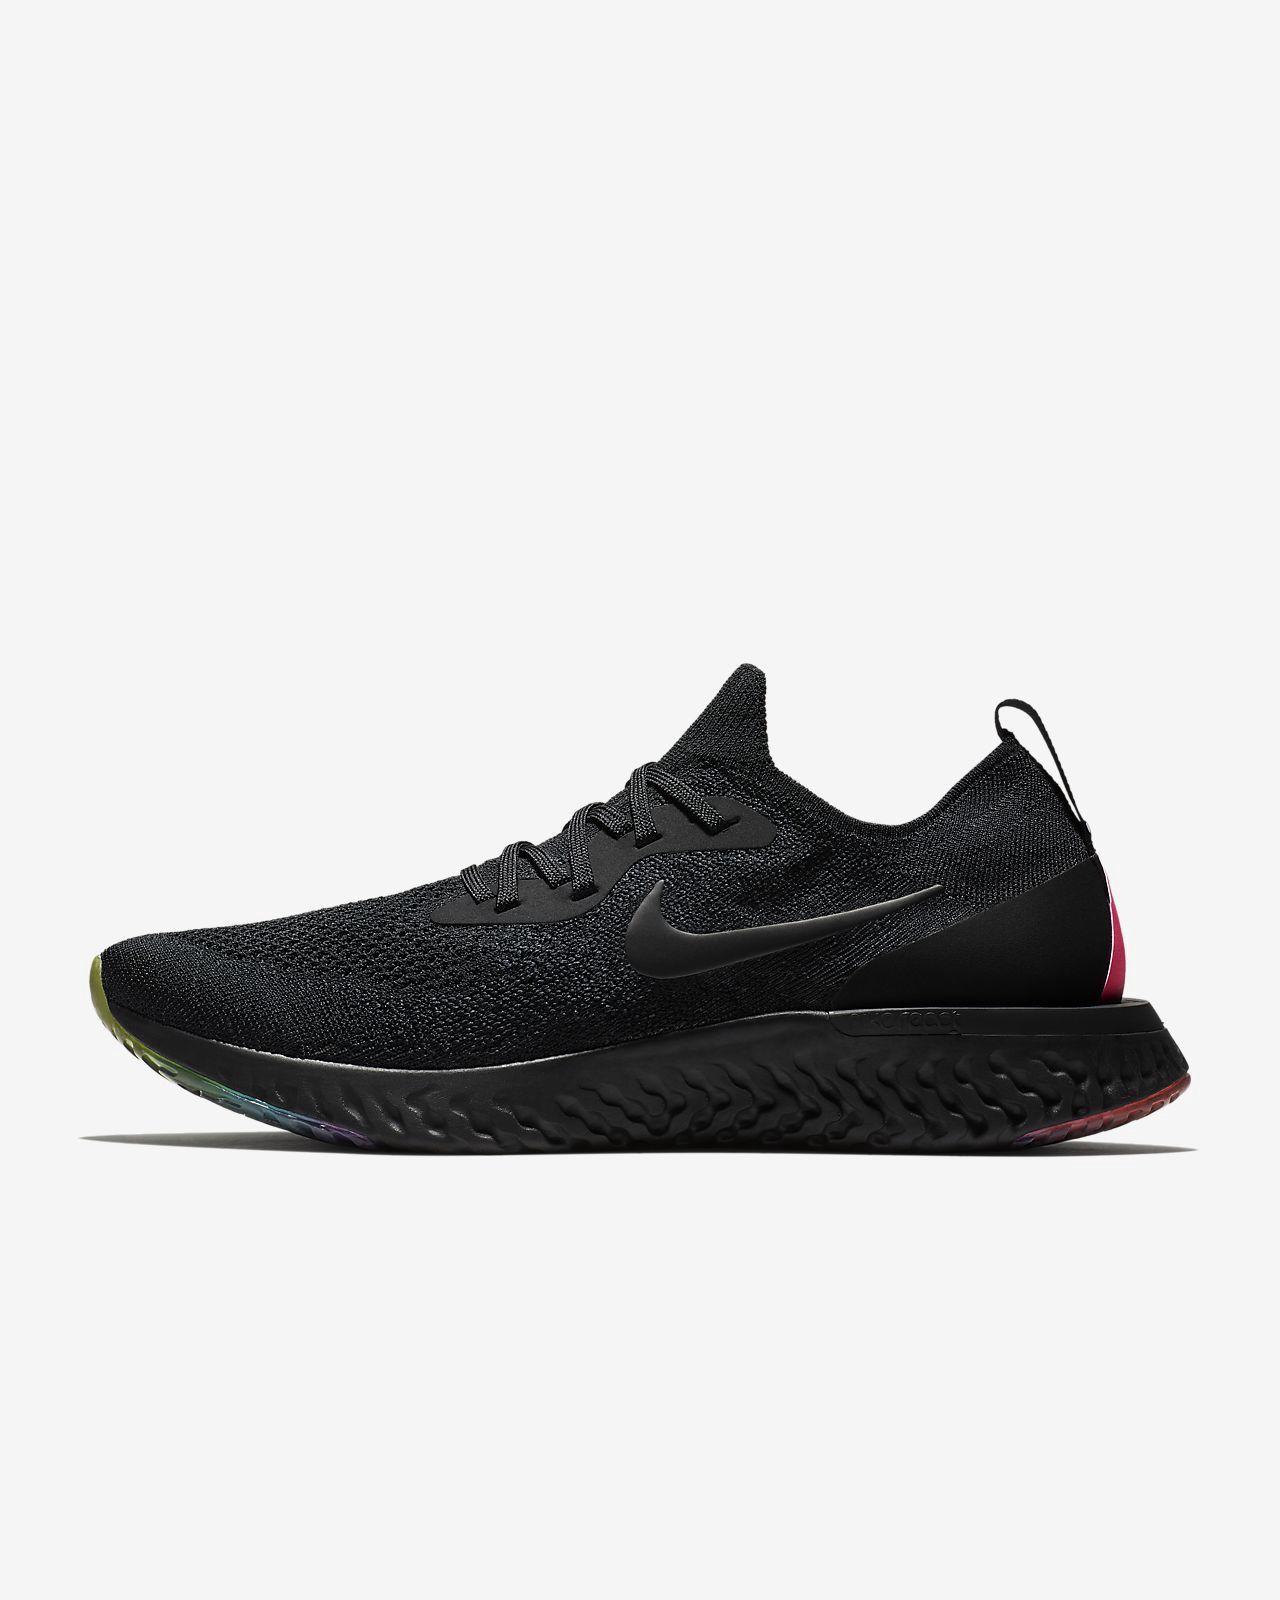 low priced a5d8f 93f0c Nike Epic React Flyknit Betrue Men s Running Shoe - M 11.5   W 13